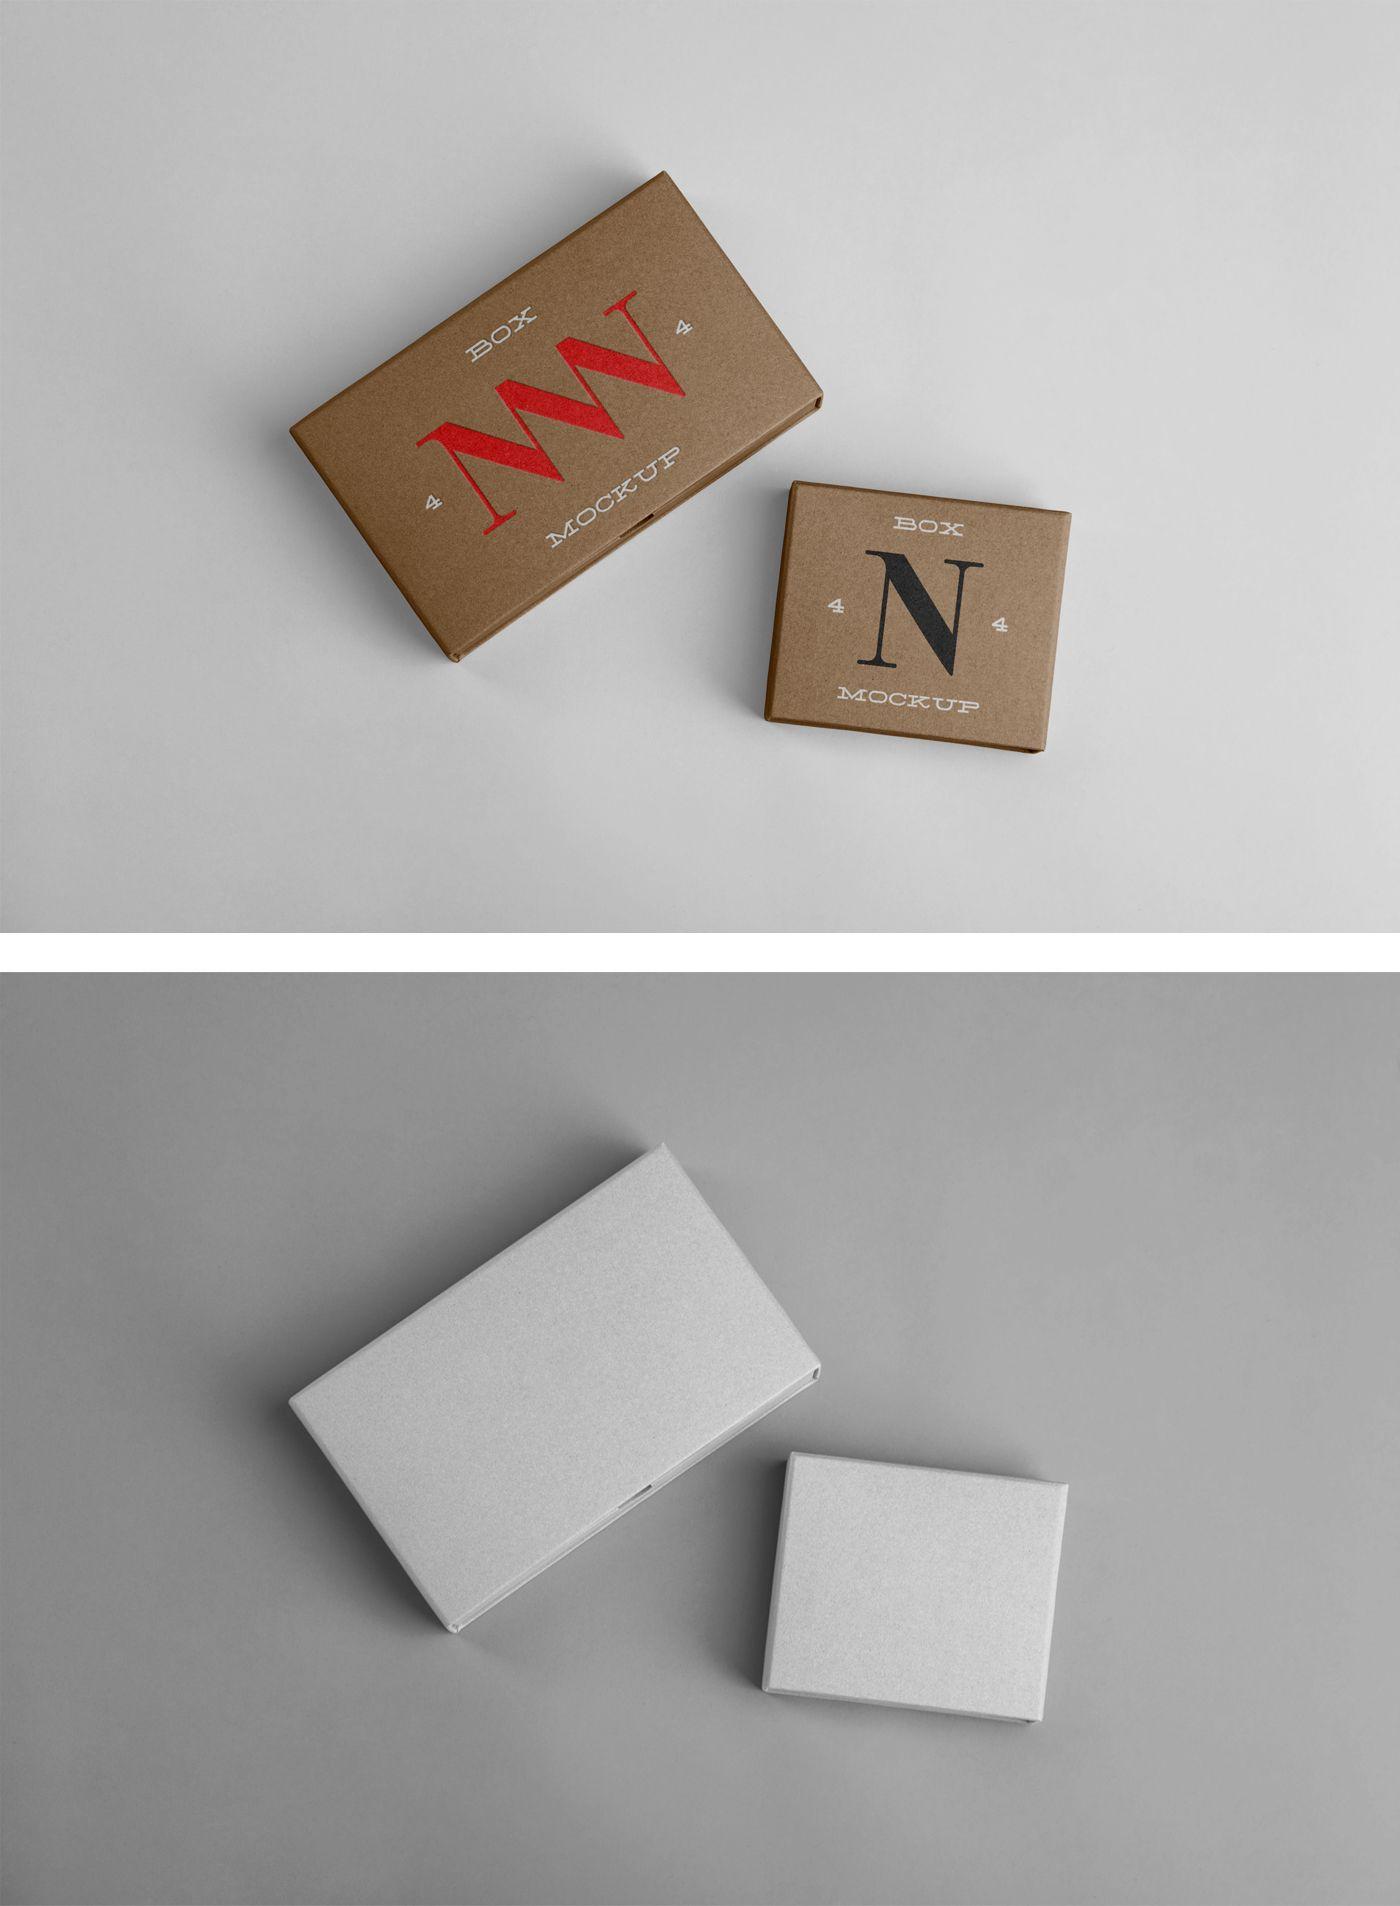 Download Paper Box Mockups Mr Mockup Graphic Design Freebies Box Mockup Graphic Design Freebies Design Freebie